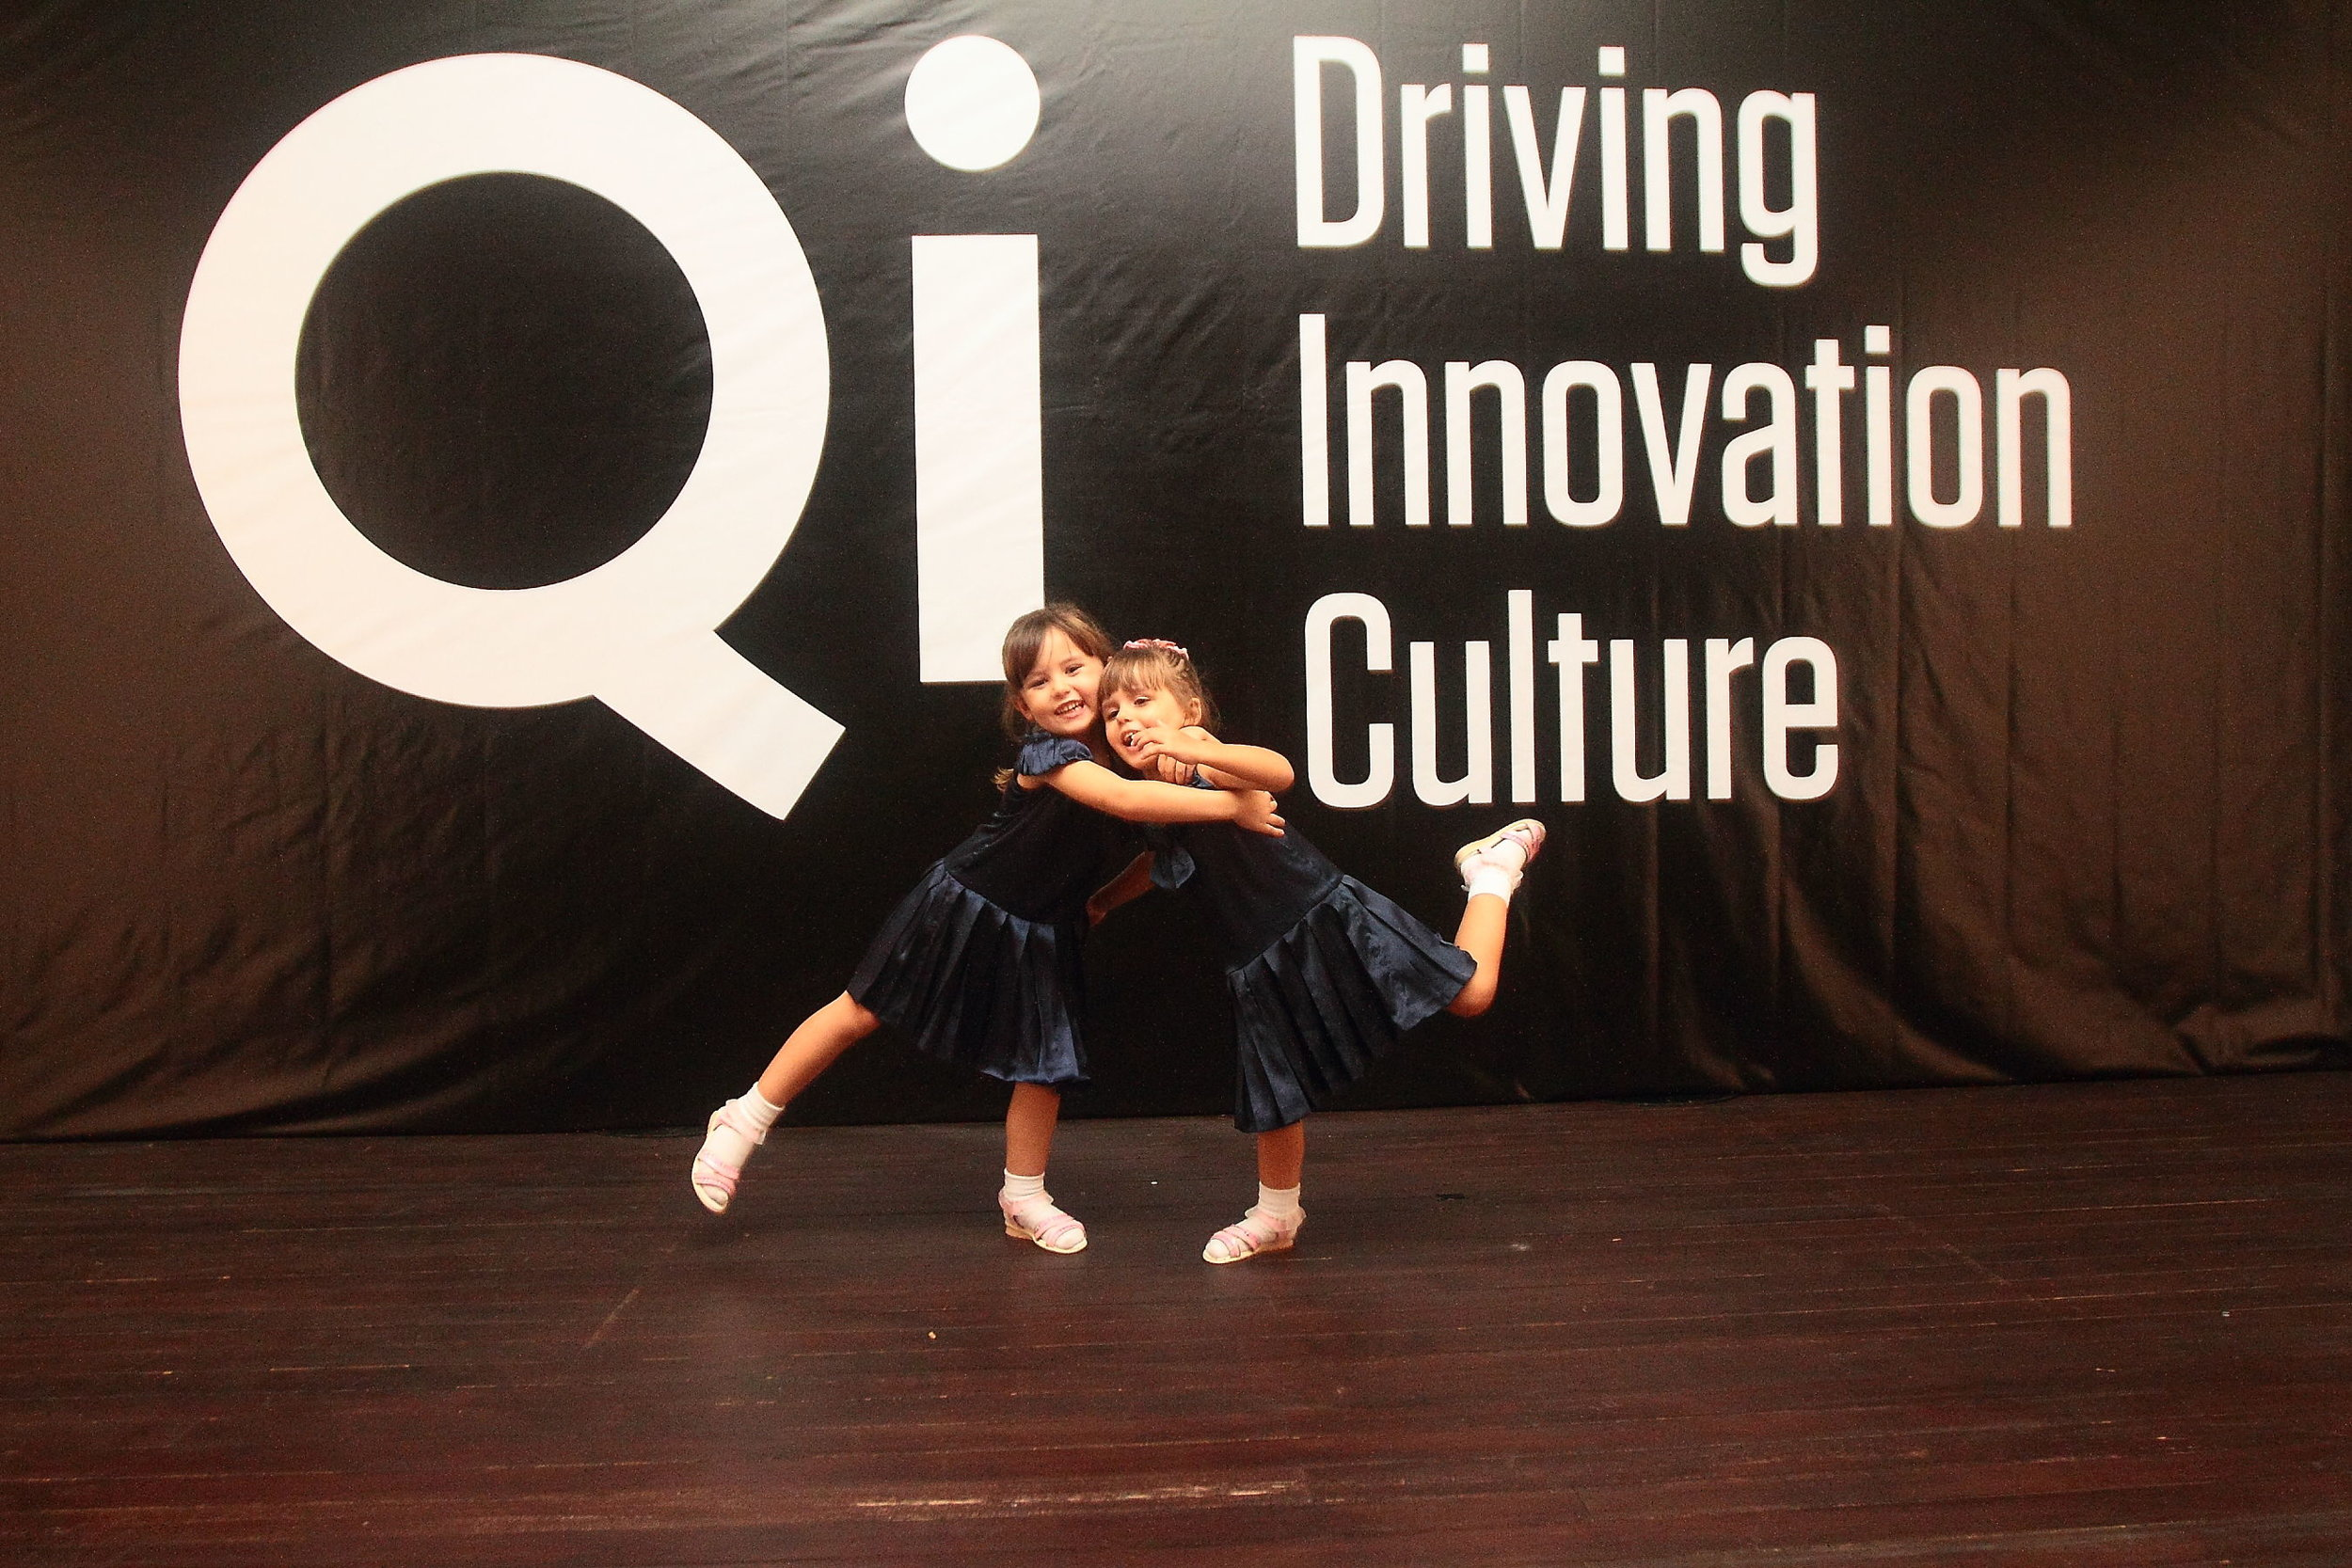 qi-global-2011-driving-innovation-culture-024.jpg